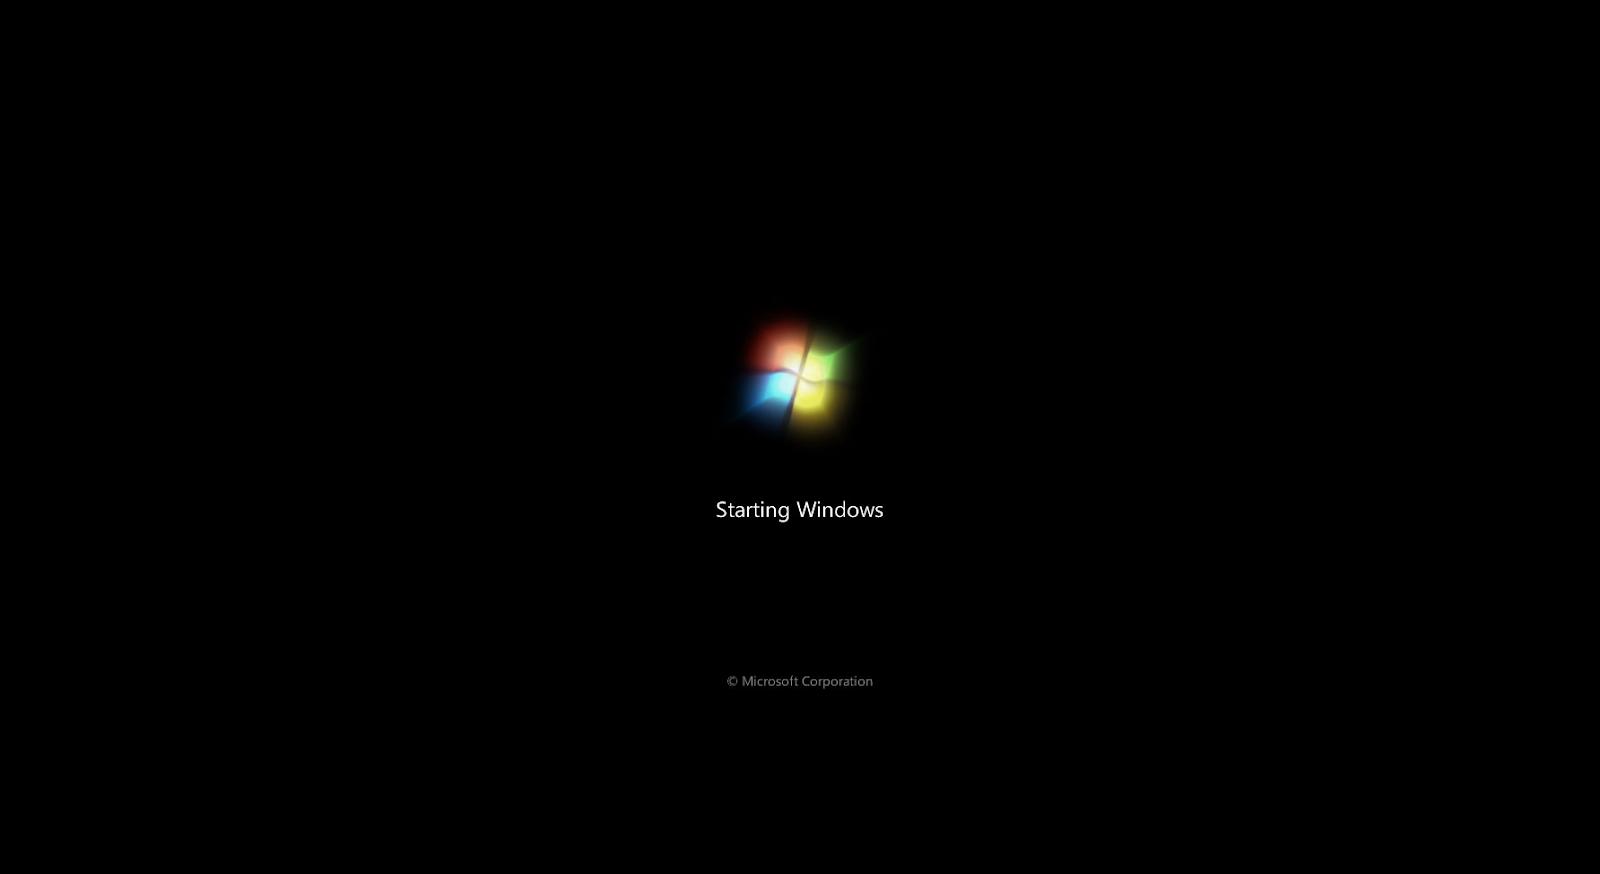 Cara Boot Windows 10 Ke Konfigurasi Baik Yang Terakhir Diketahui